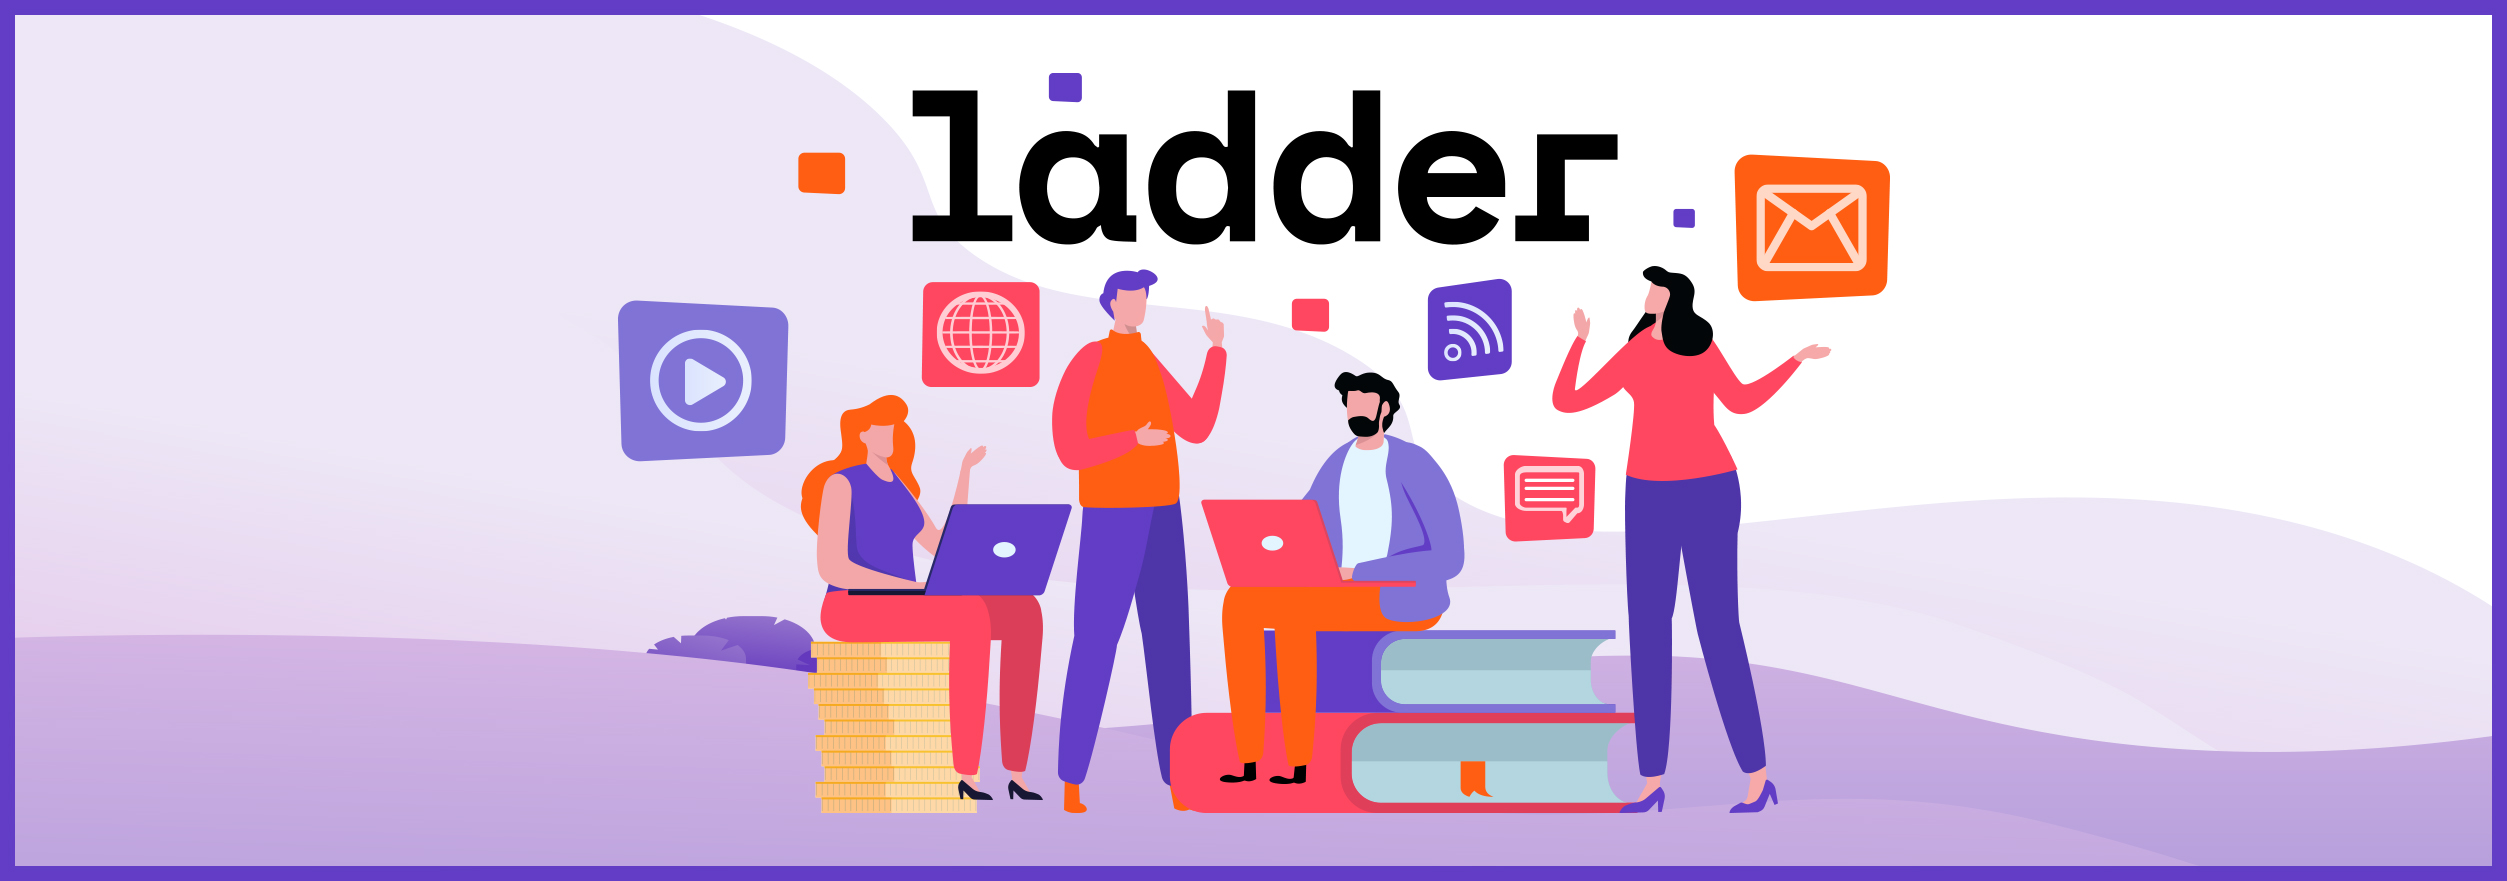 Ladder.io's Marketing Strategy Executive Summary [Free Template]